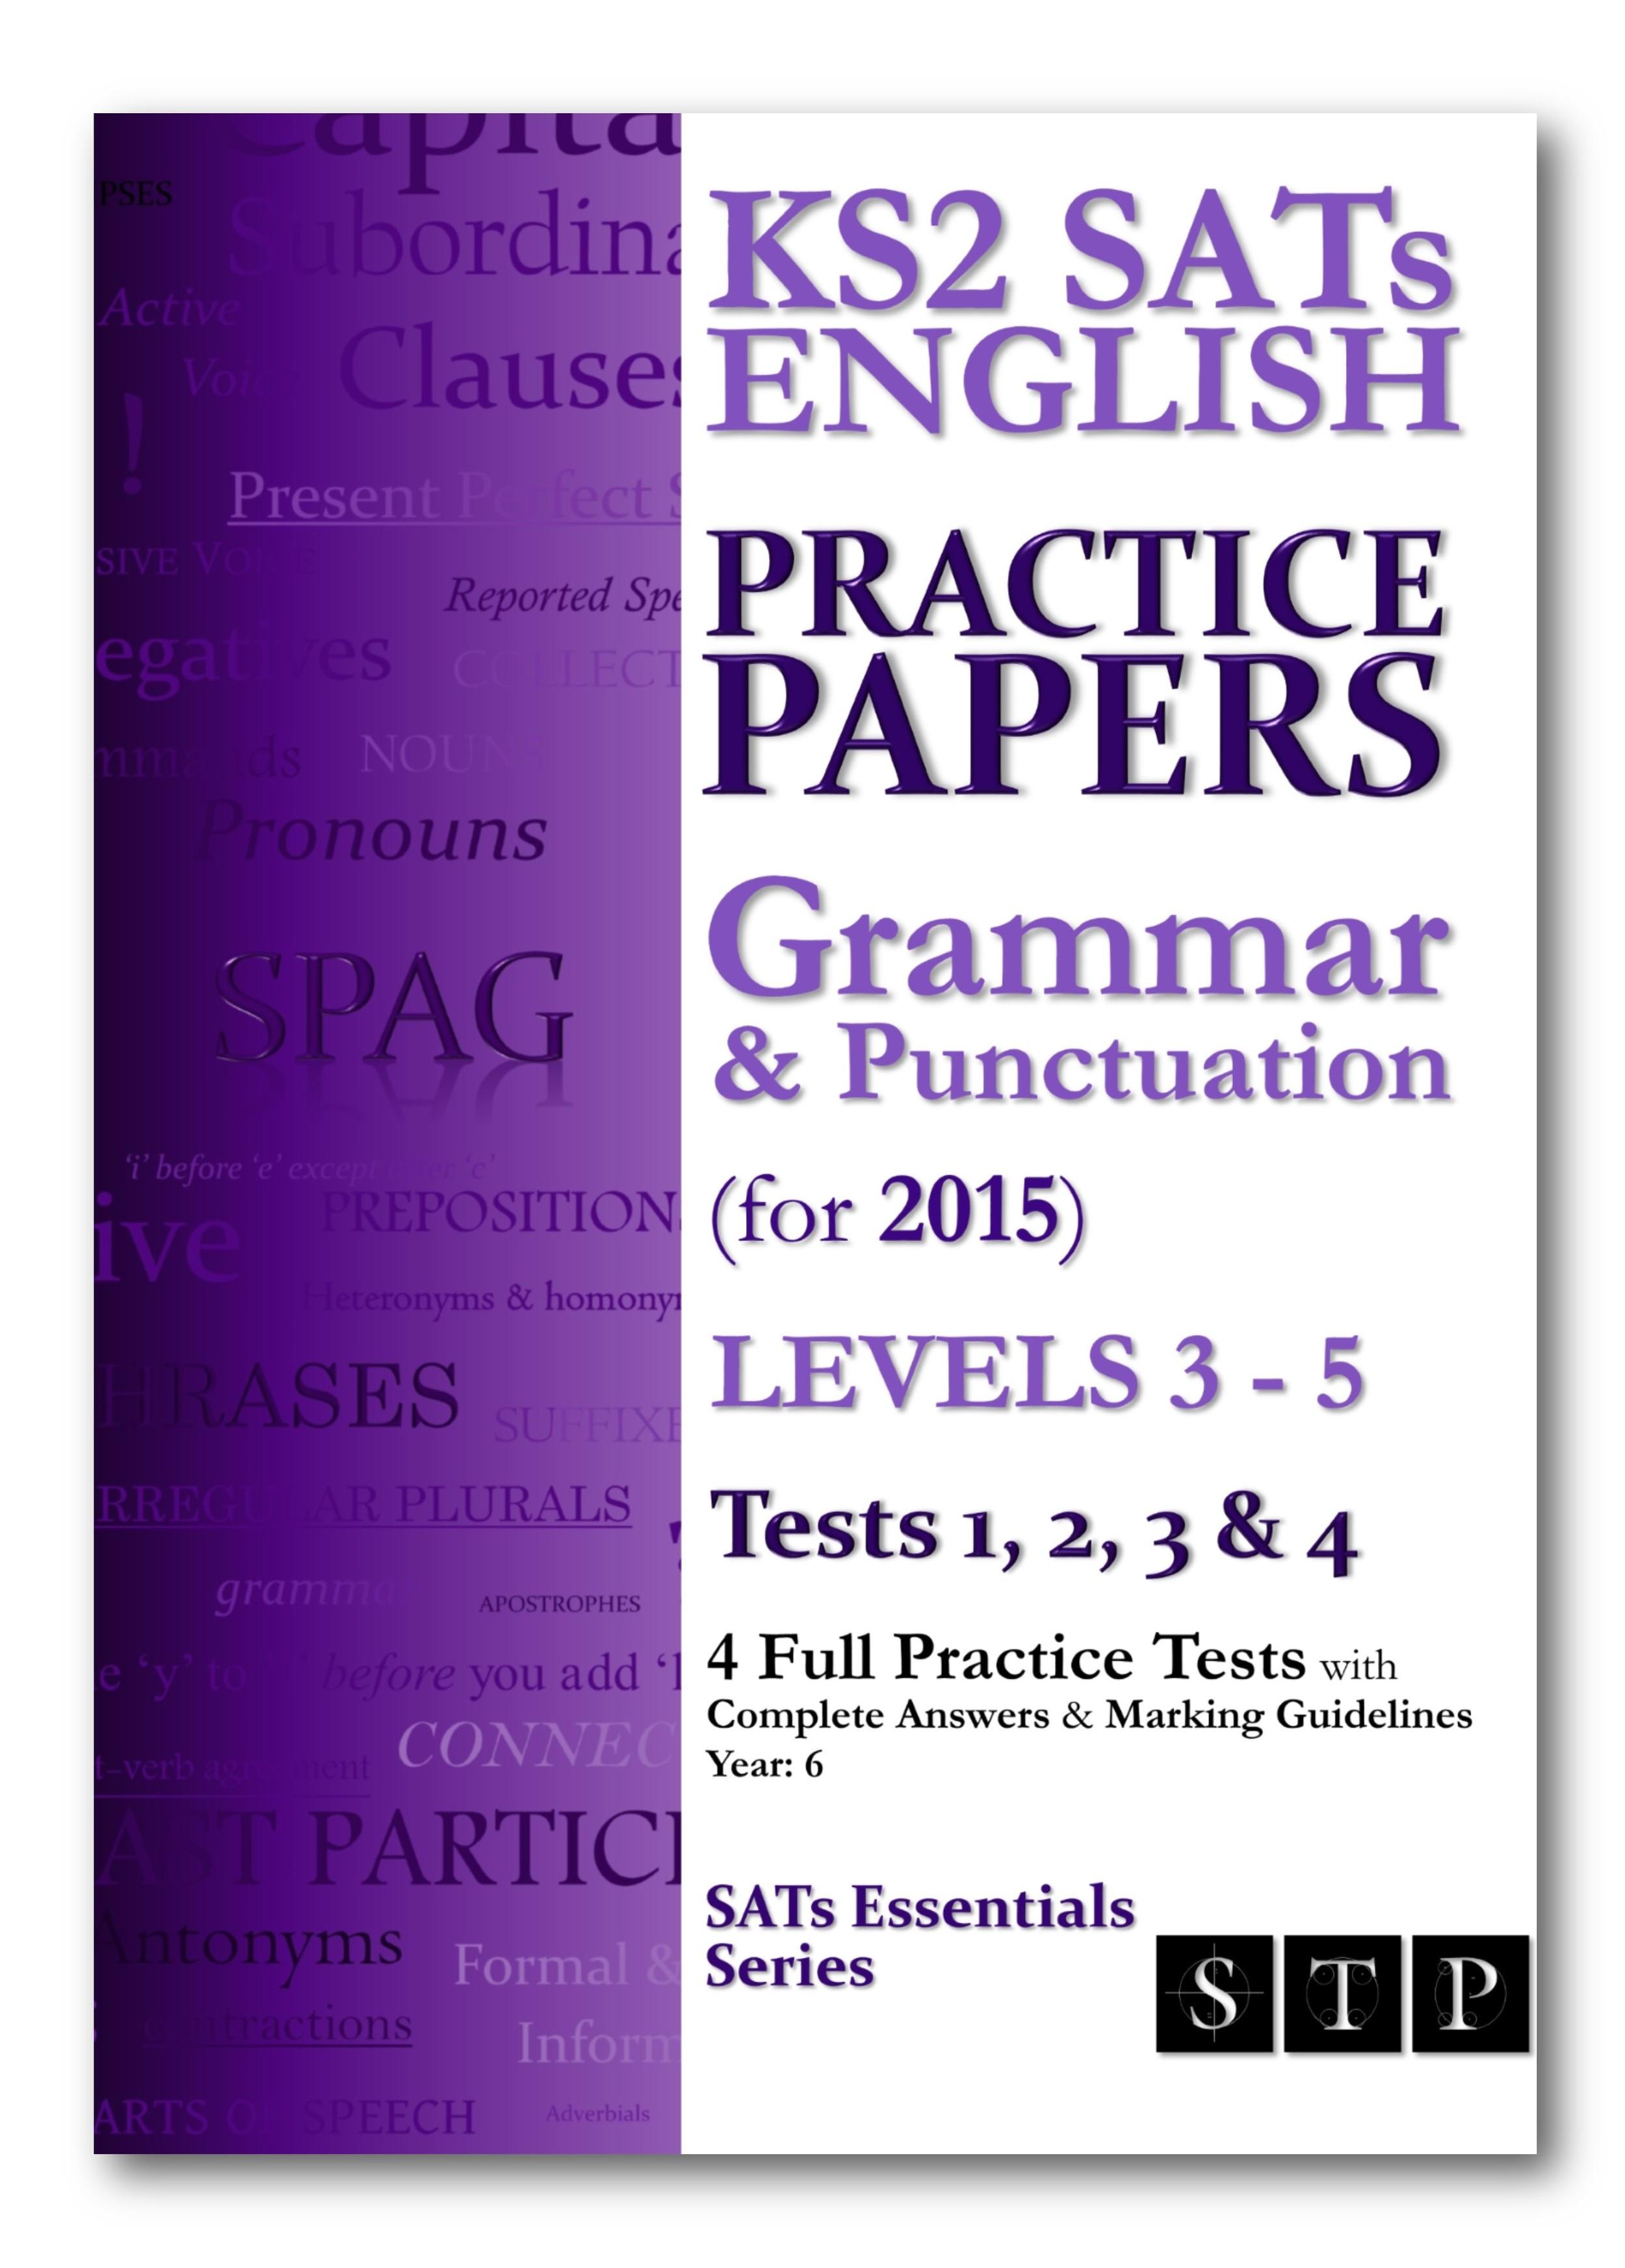 KS2 SATS Grammar & Punctuation Practice Papers Levels 3-5 Tests 1, 2, 3 & 4